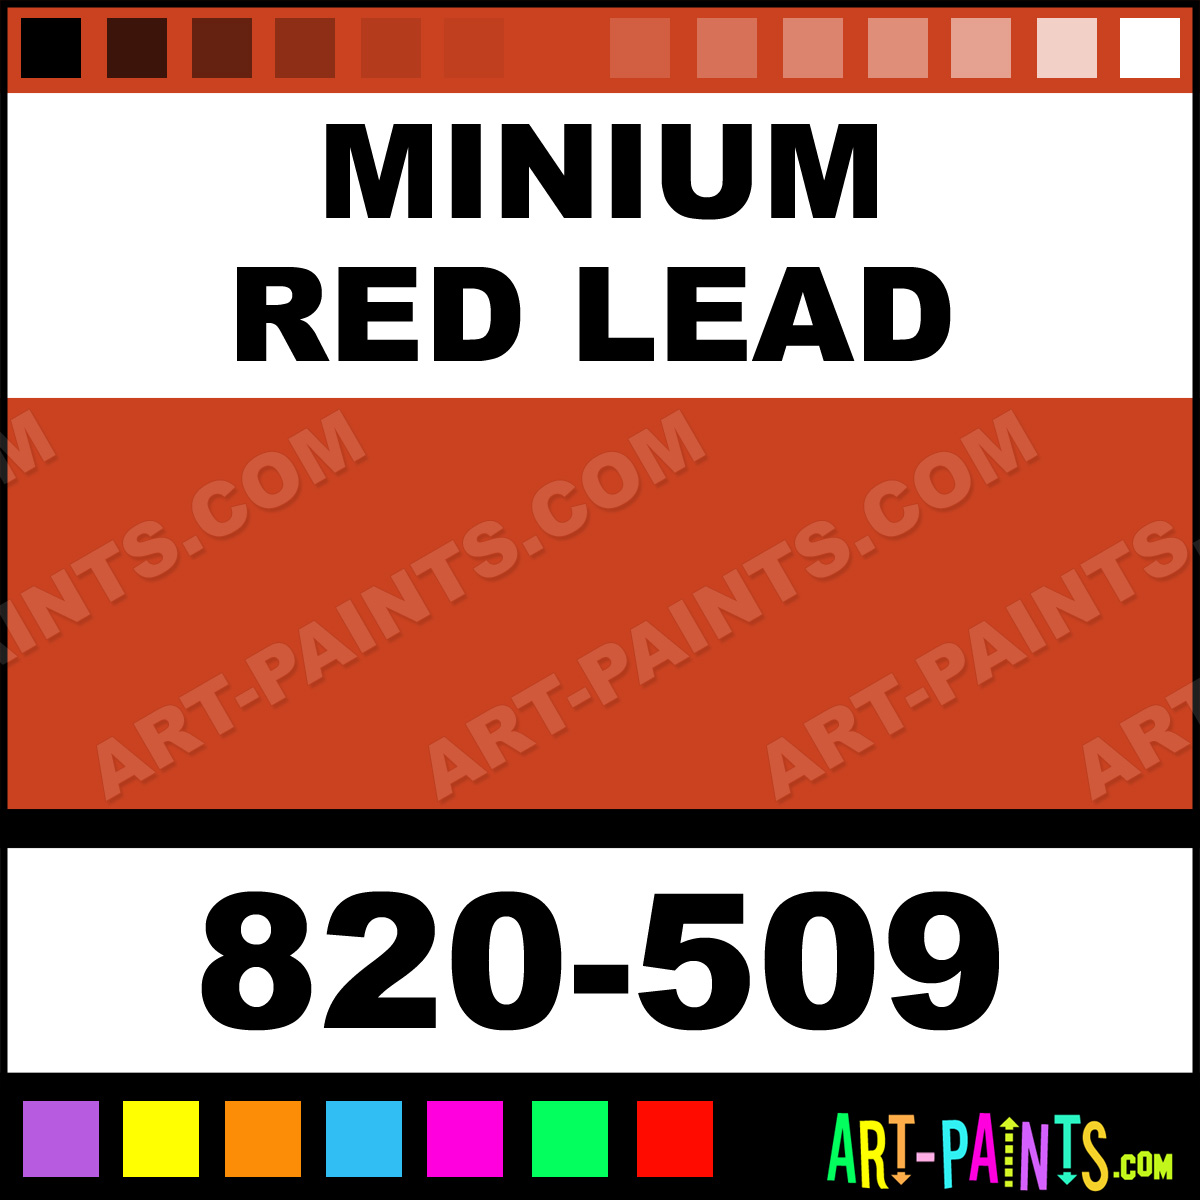 minium red lead artist oil paints 820 509 minium red lead paint. Black Bedroom Furniture Sets. Home Design Ideas